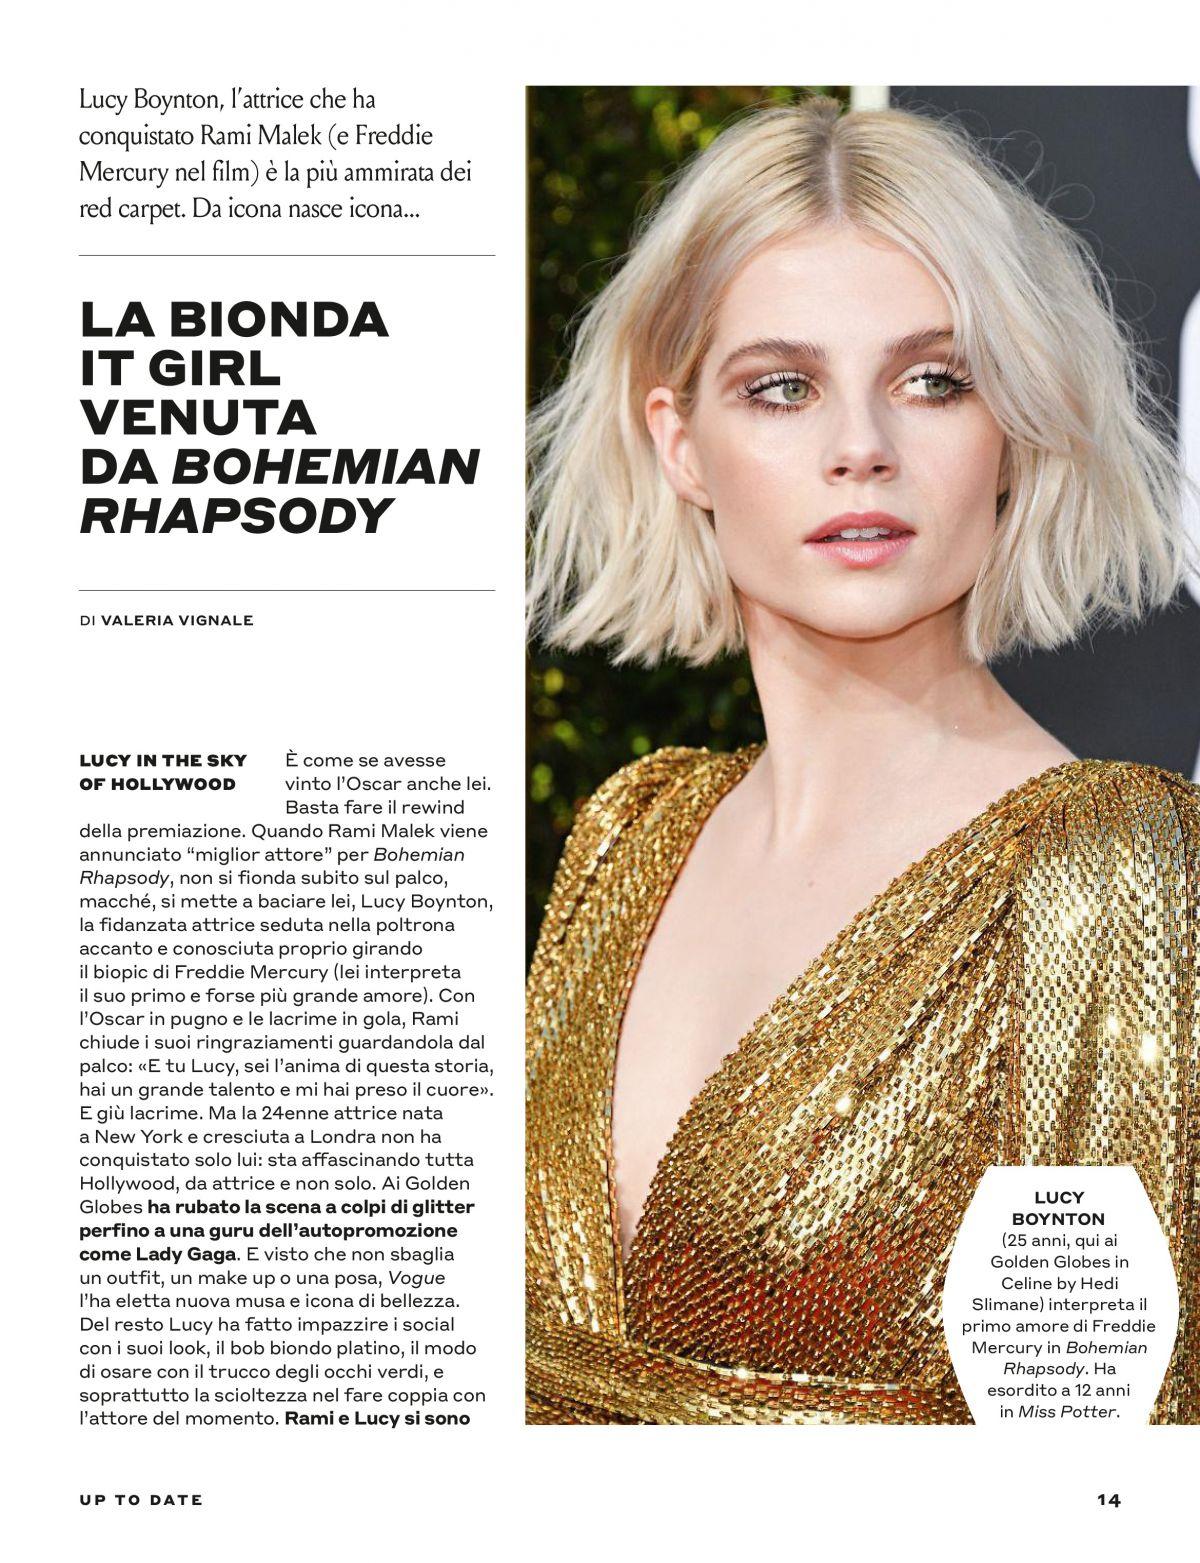 Tustyle Magazine November 2015 Issue: LUCY BOYNTON In Tu Style Magazine, March 2019